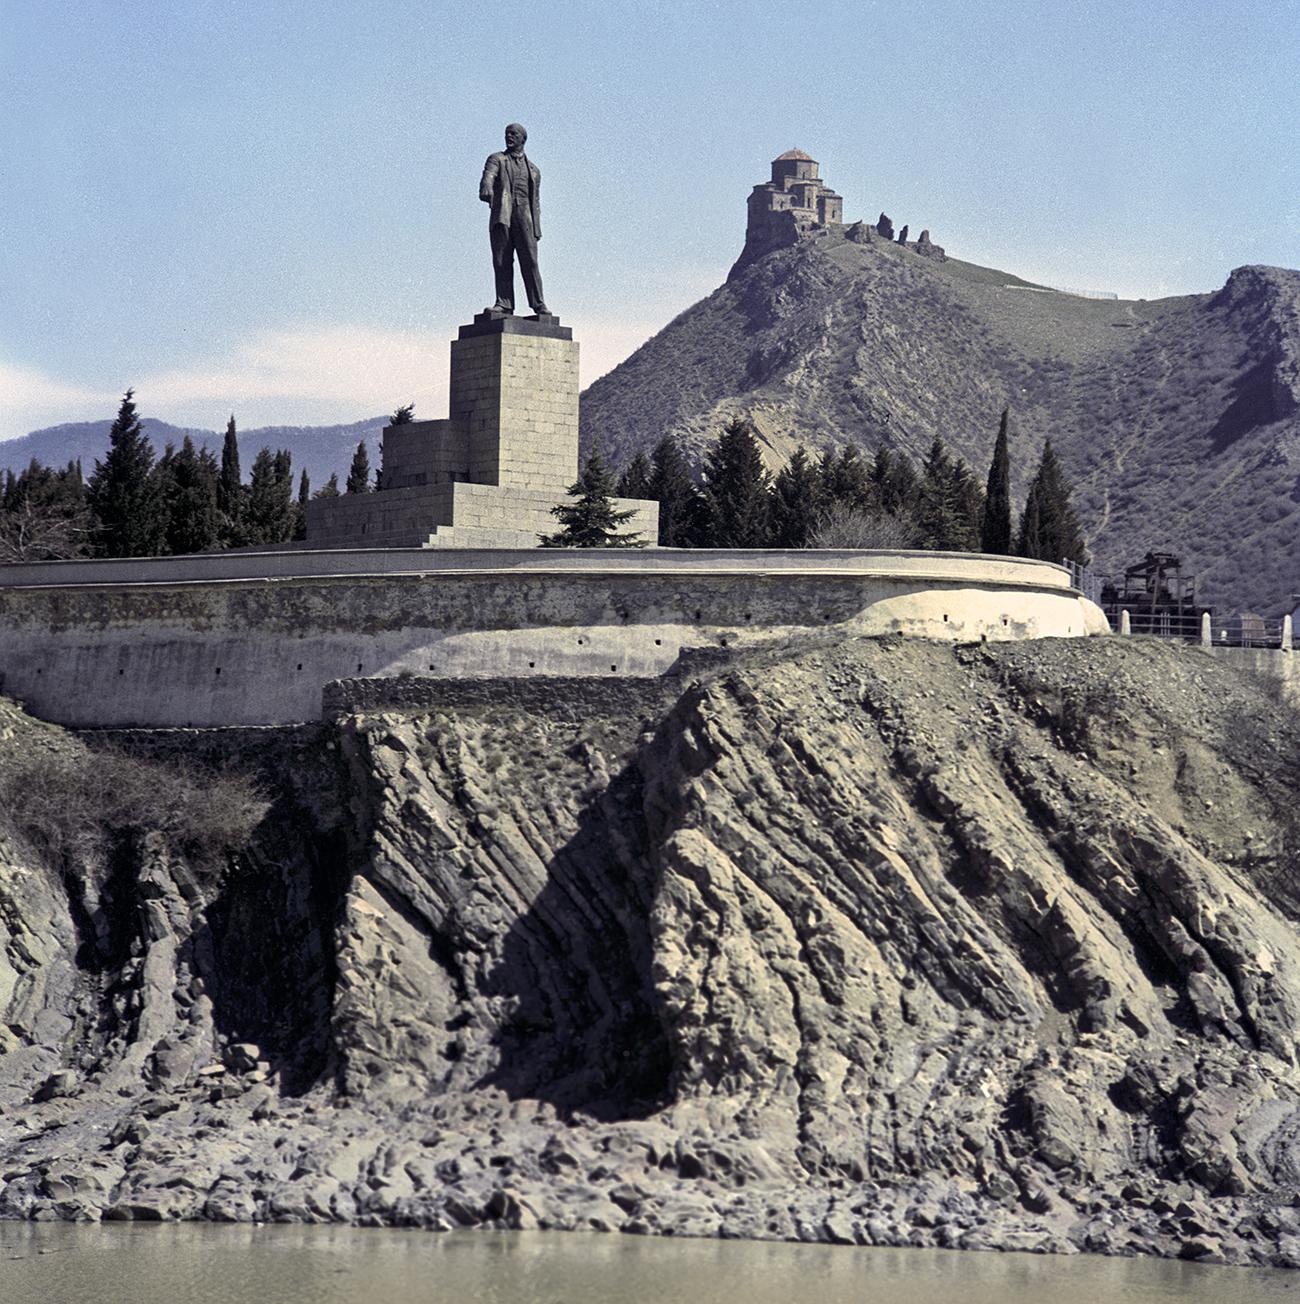 Monument to Vladimir Lenin by the Zemo-Avchalskaya hydroelectric power plant. Sculptor Ivan Shadr, architects Anatoly Kalgin, Konstantin Leontyev, M. Machavariani, 1927. Dismantled in 1991. Source: Eduard Pesov/RIA Novosti